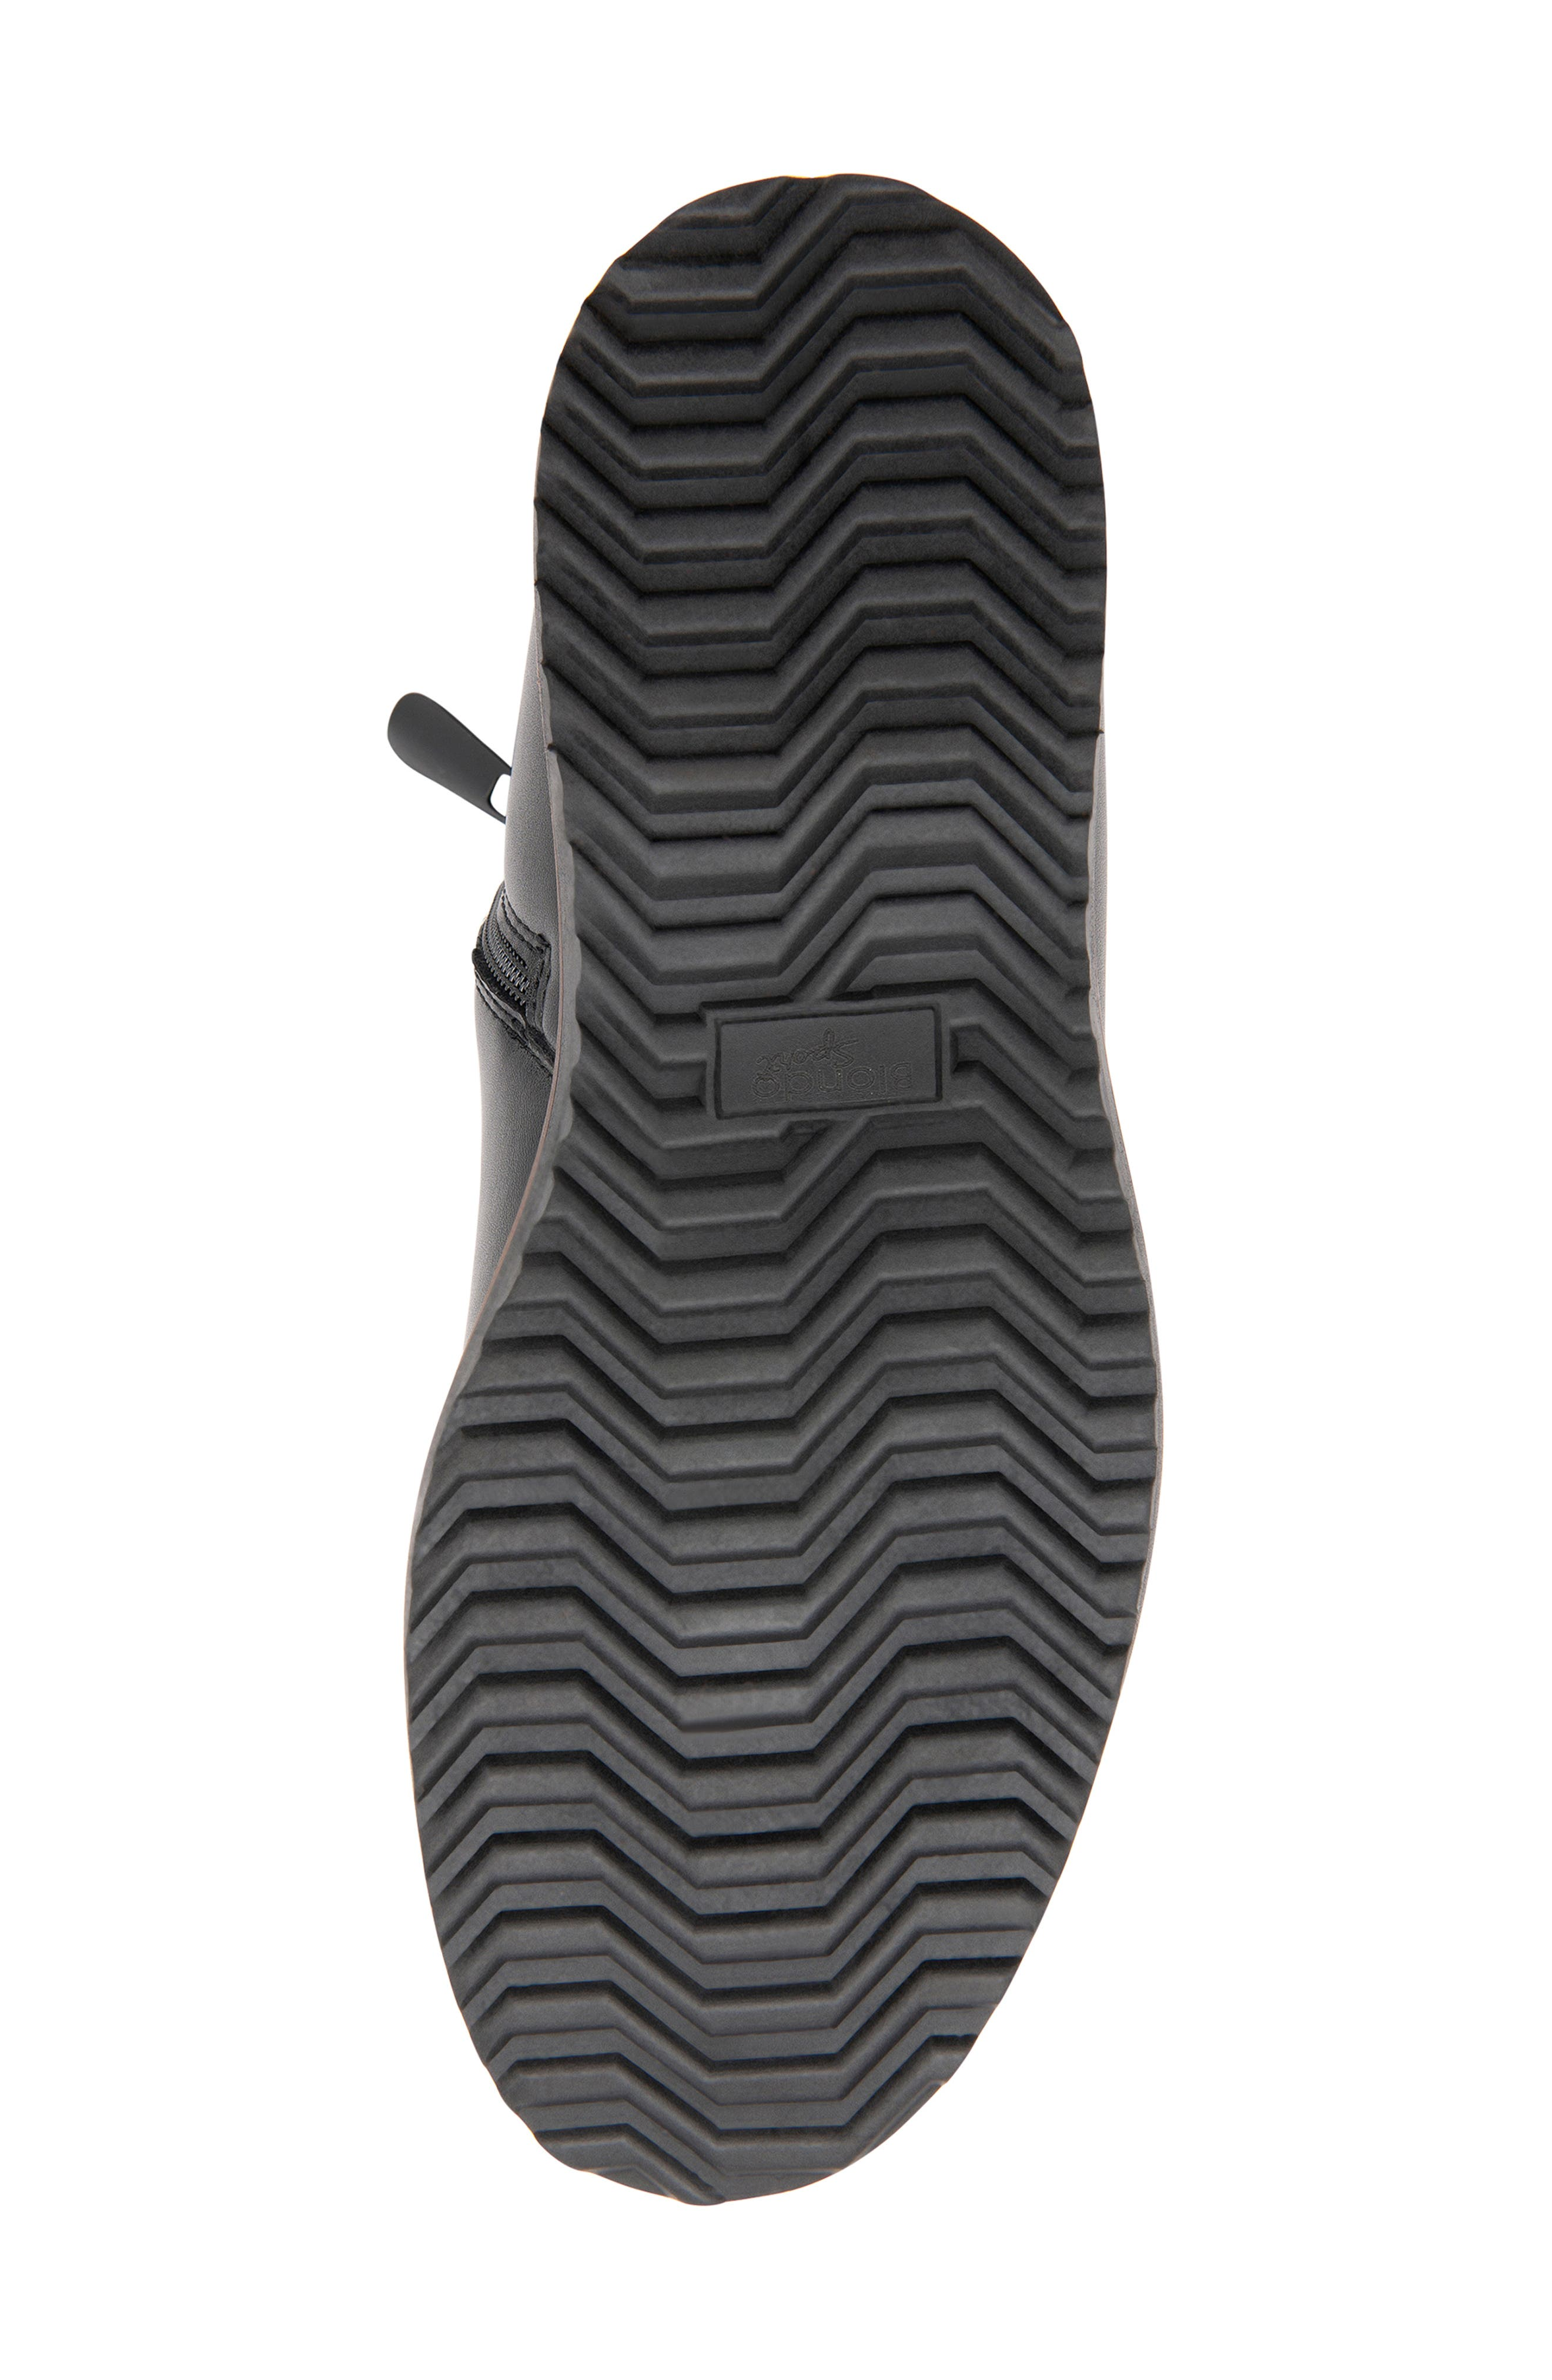 BLONDO, Morgan Waterproof Plain Toe Boot, Alternate thumbnail 5, color, BLACK LEATHER